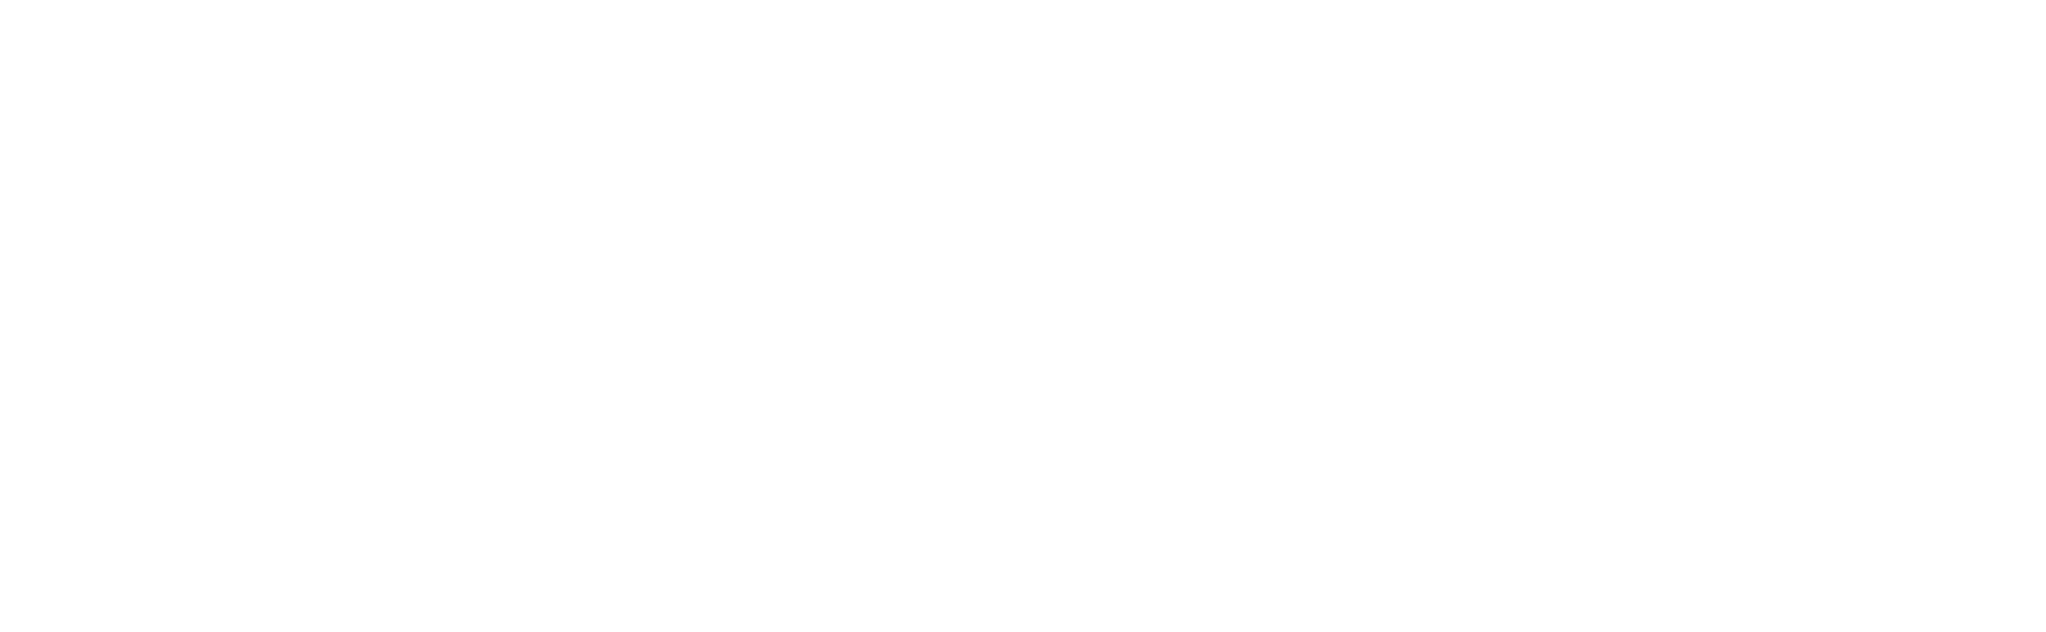 wec-logo-wht.png